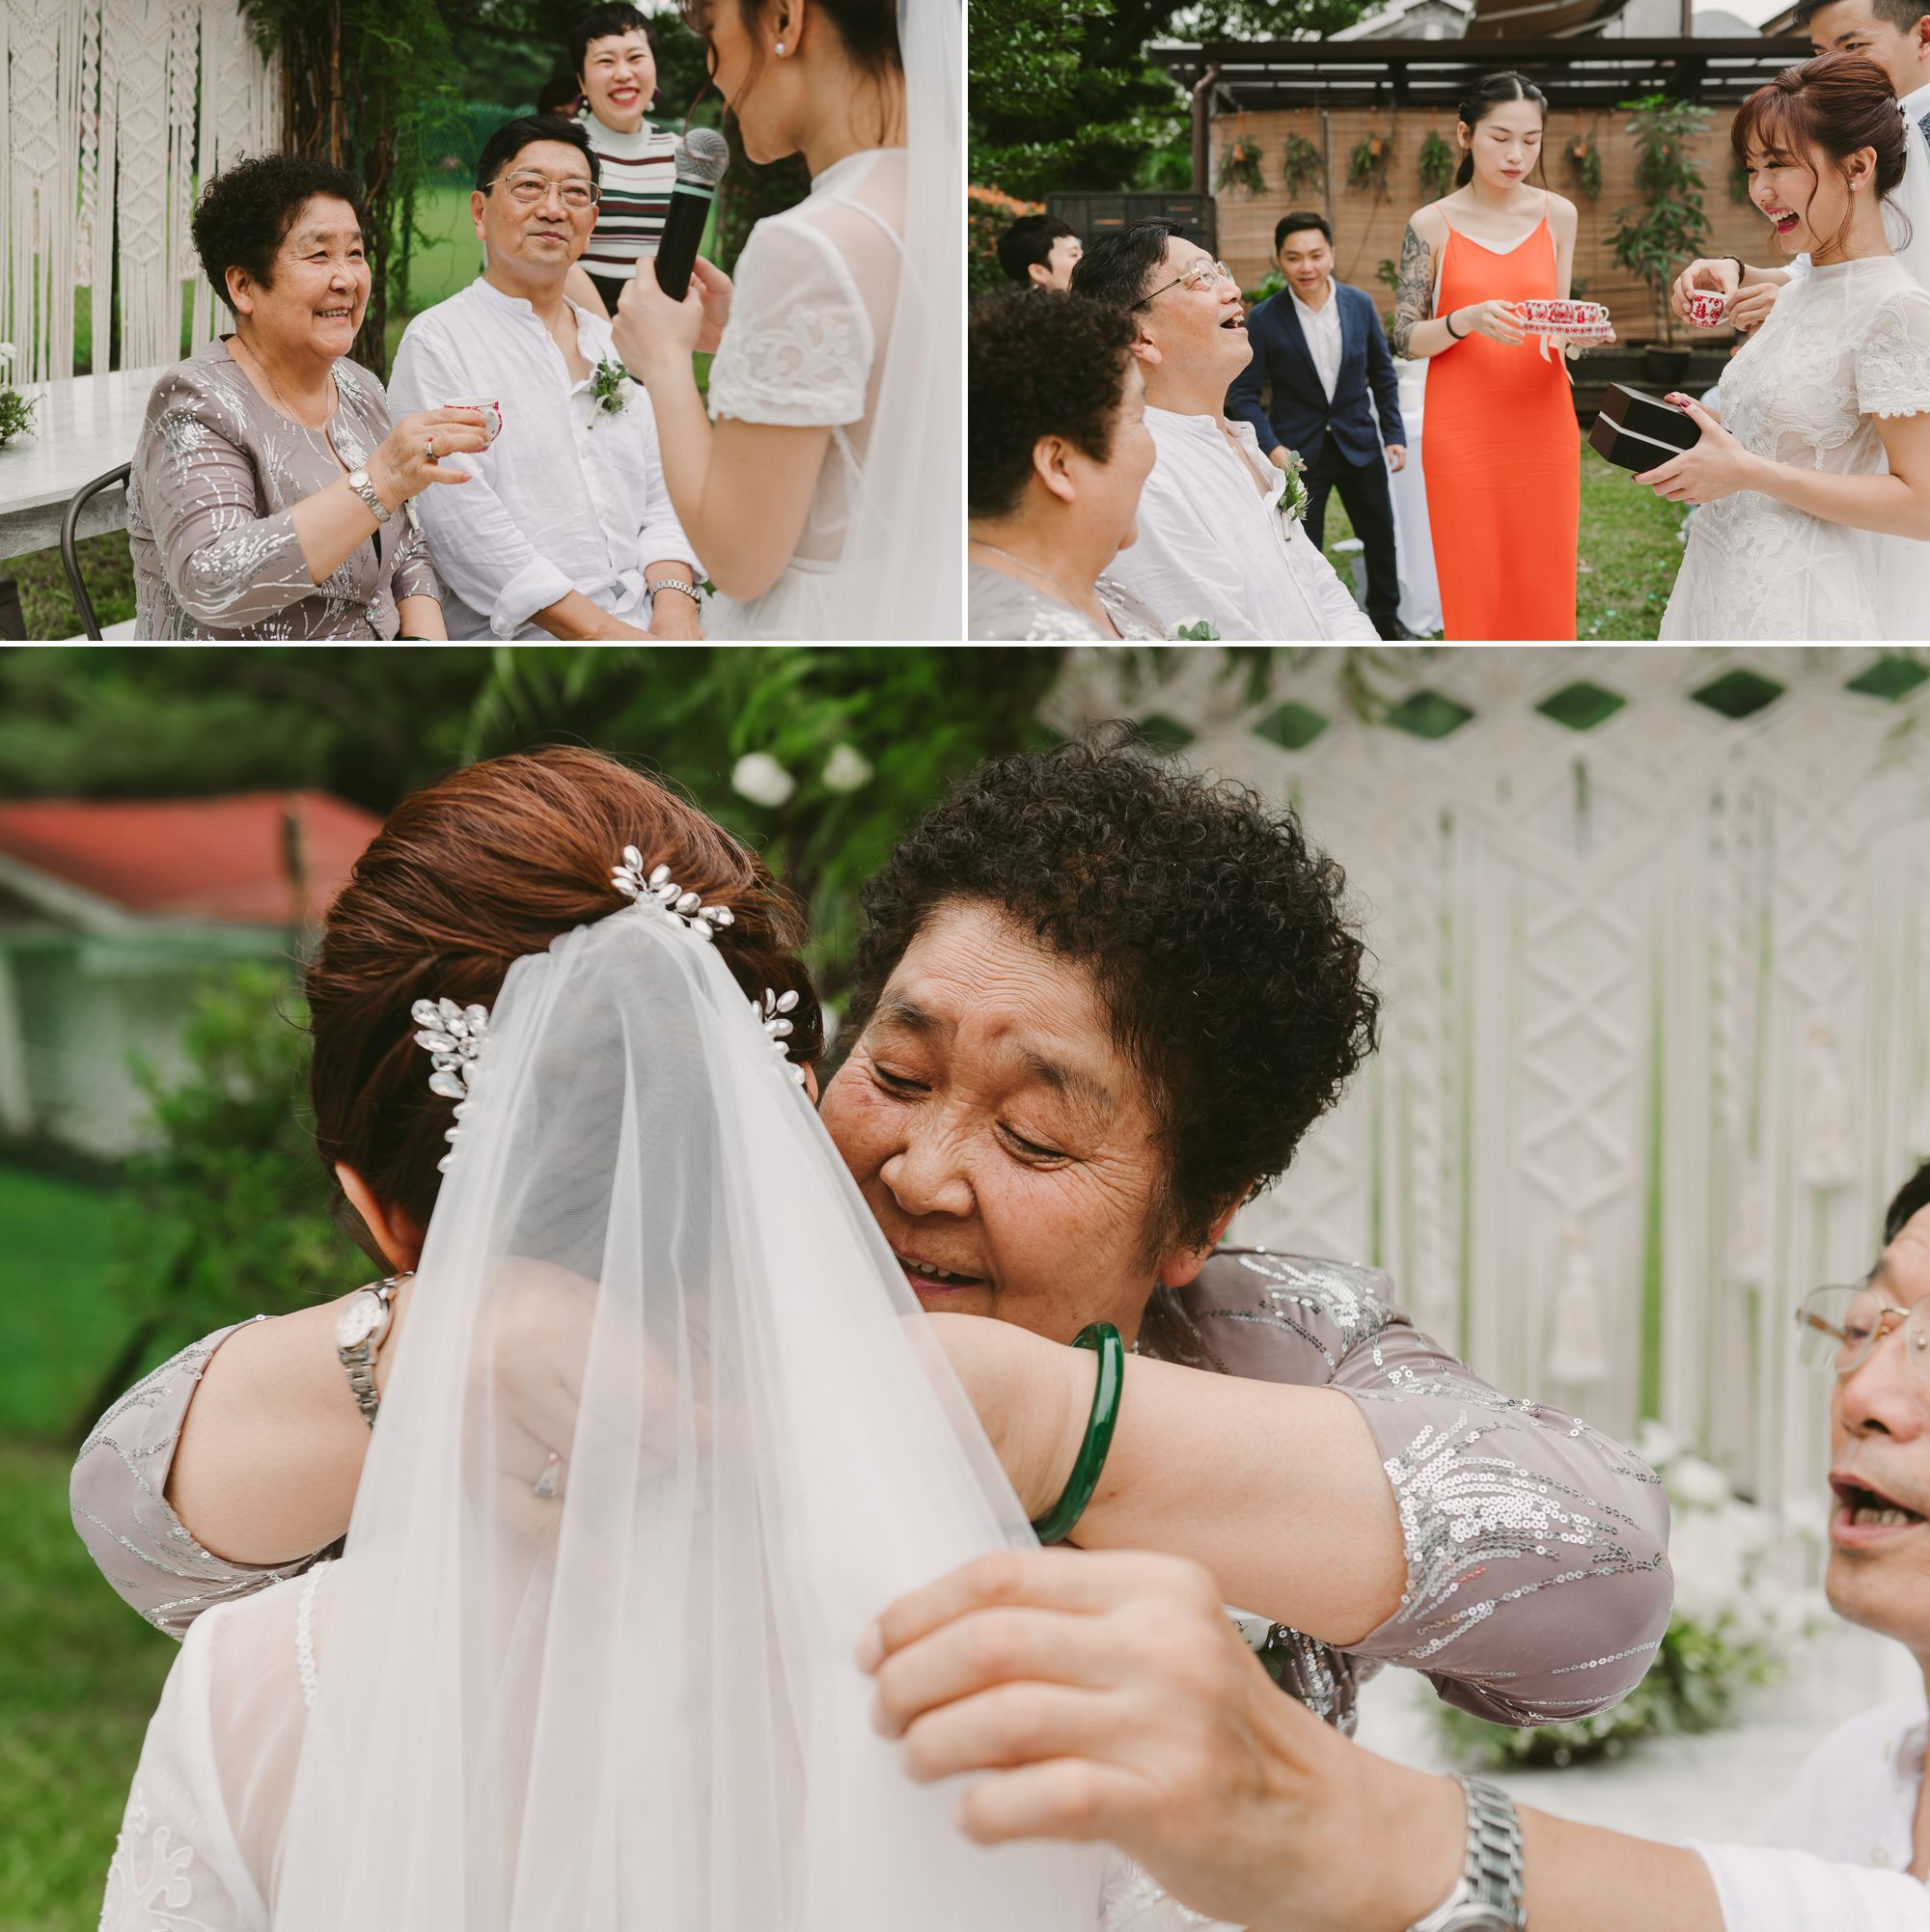 wedding_photography 25.jpg